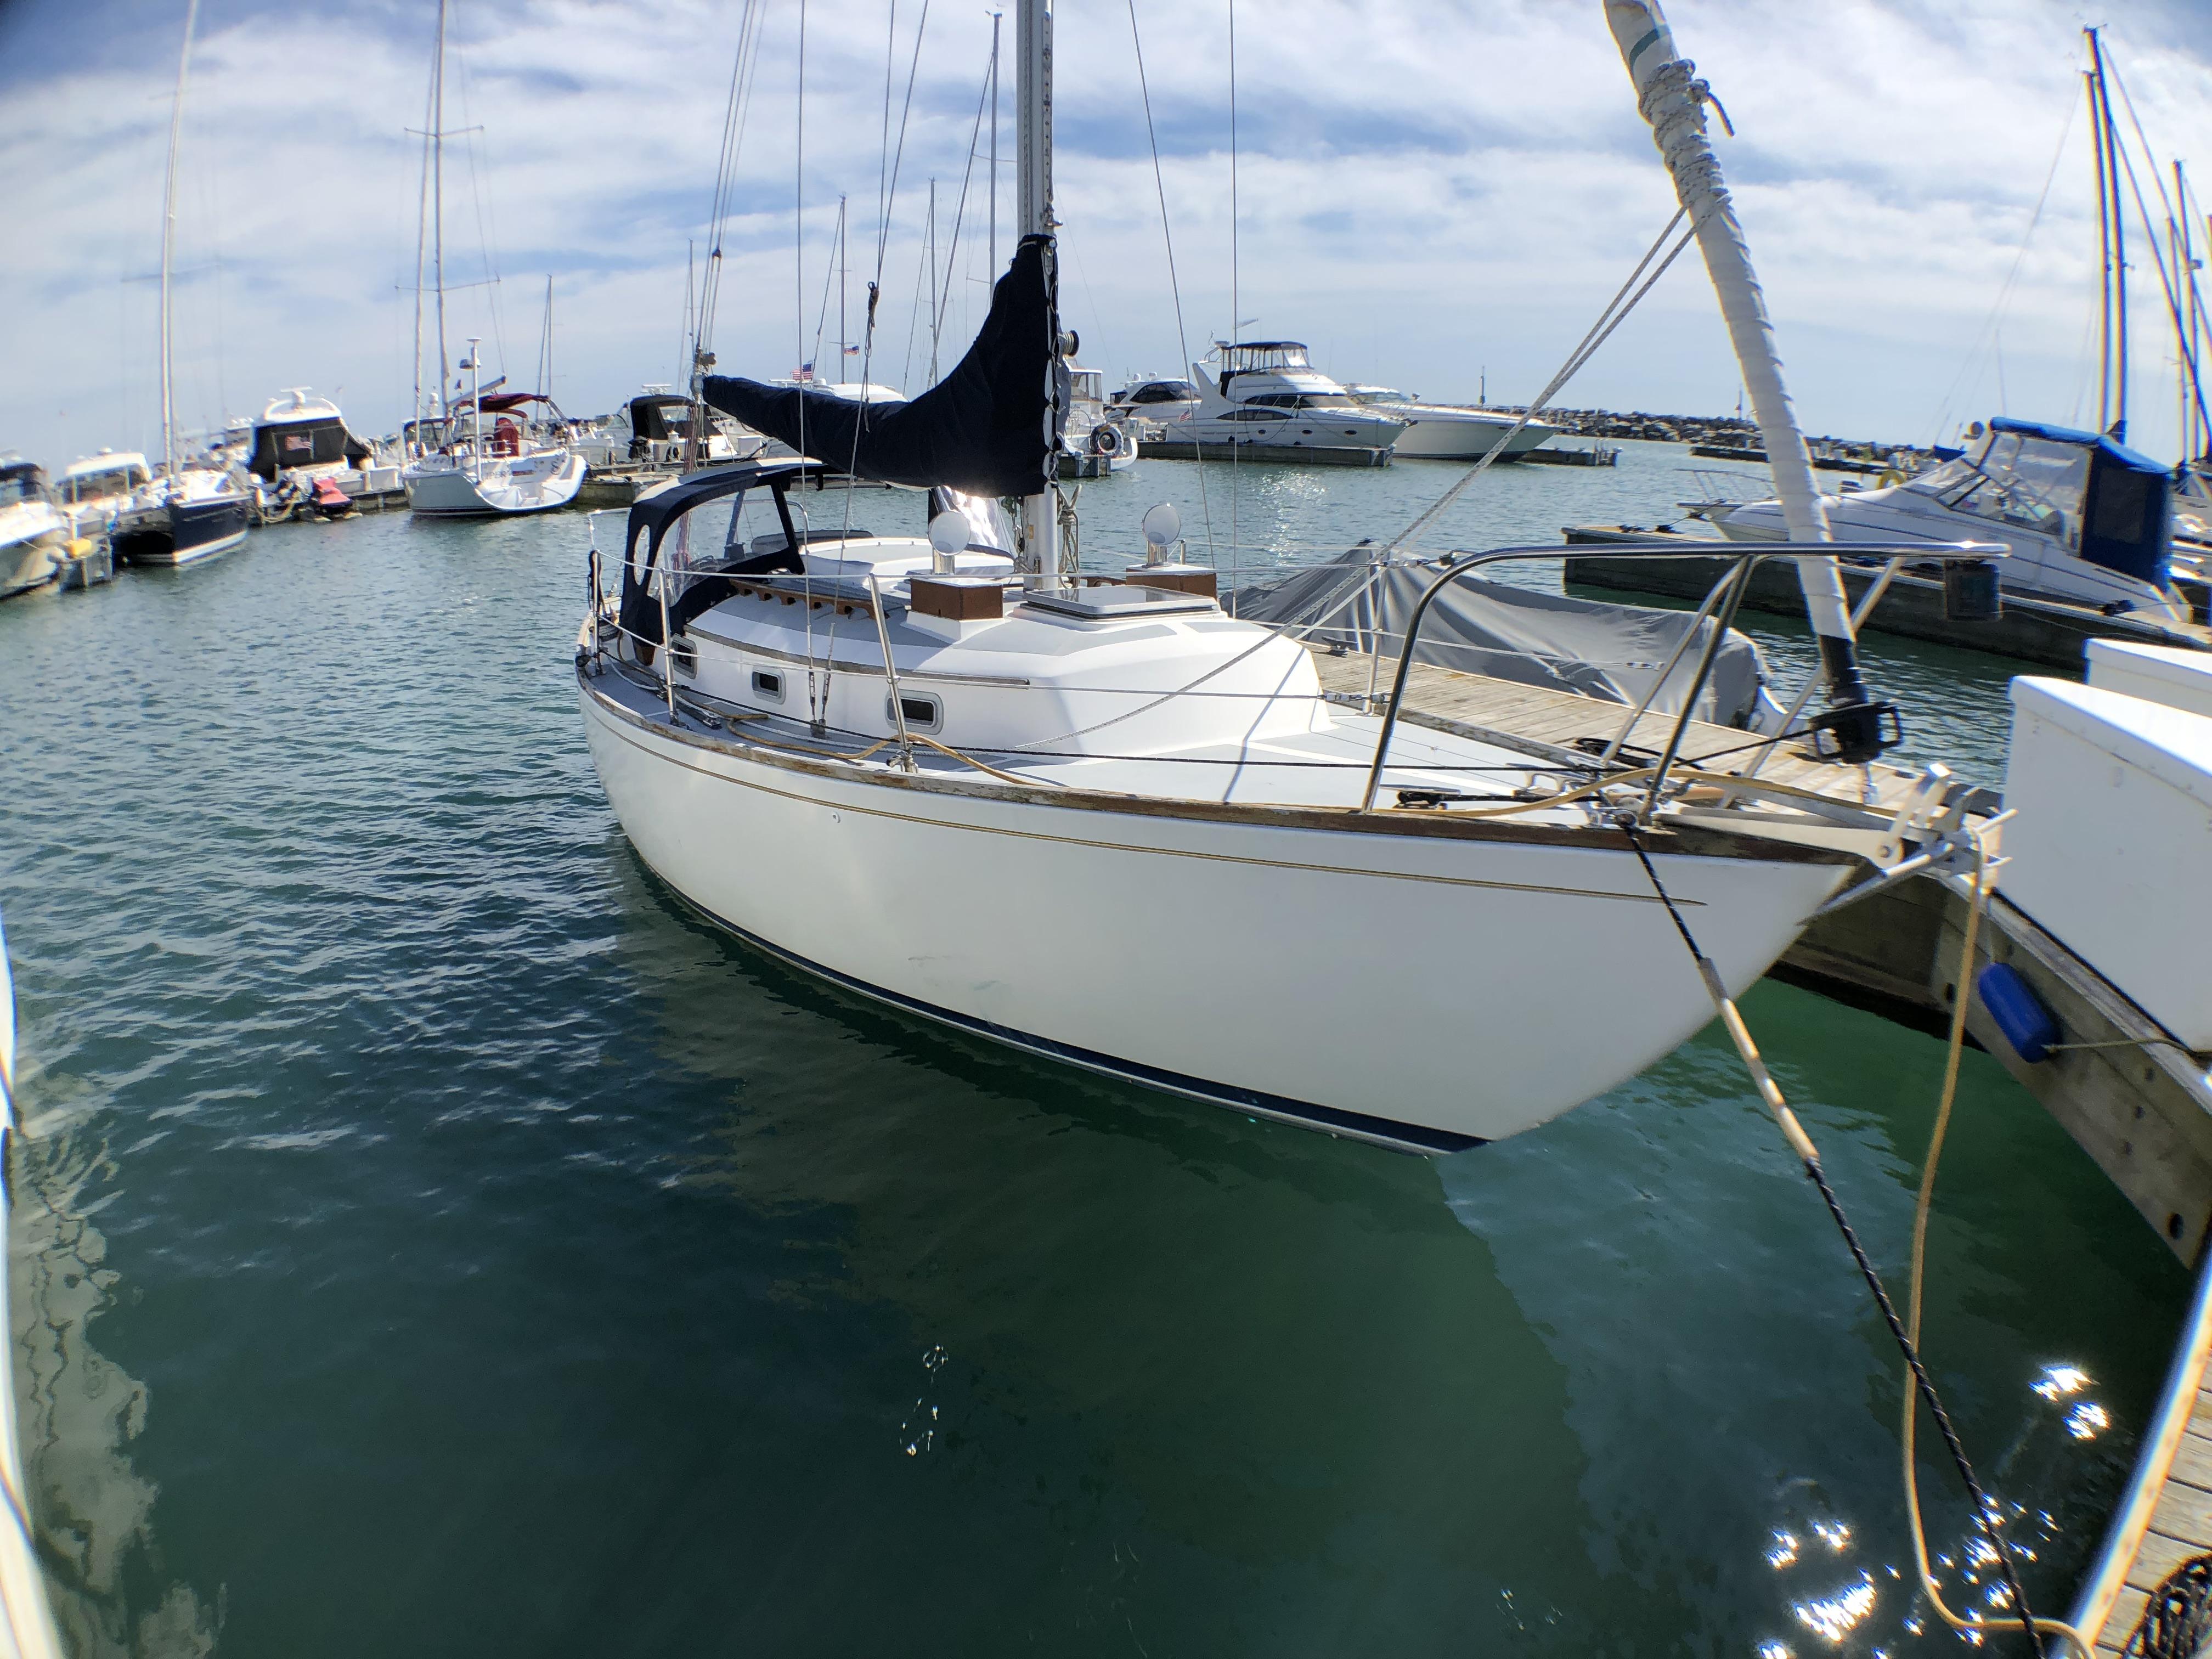 C.E. Ryder Sea Sprite Starboard Forward